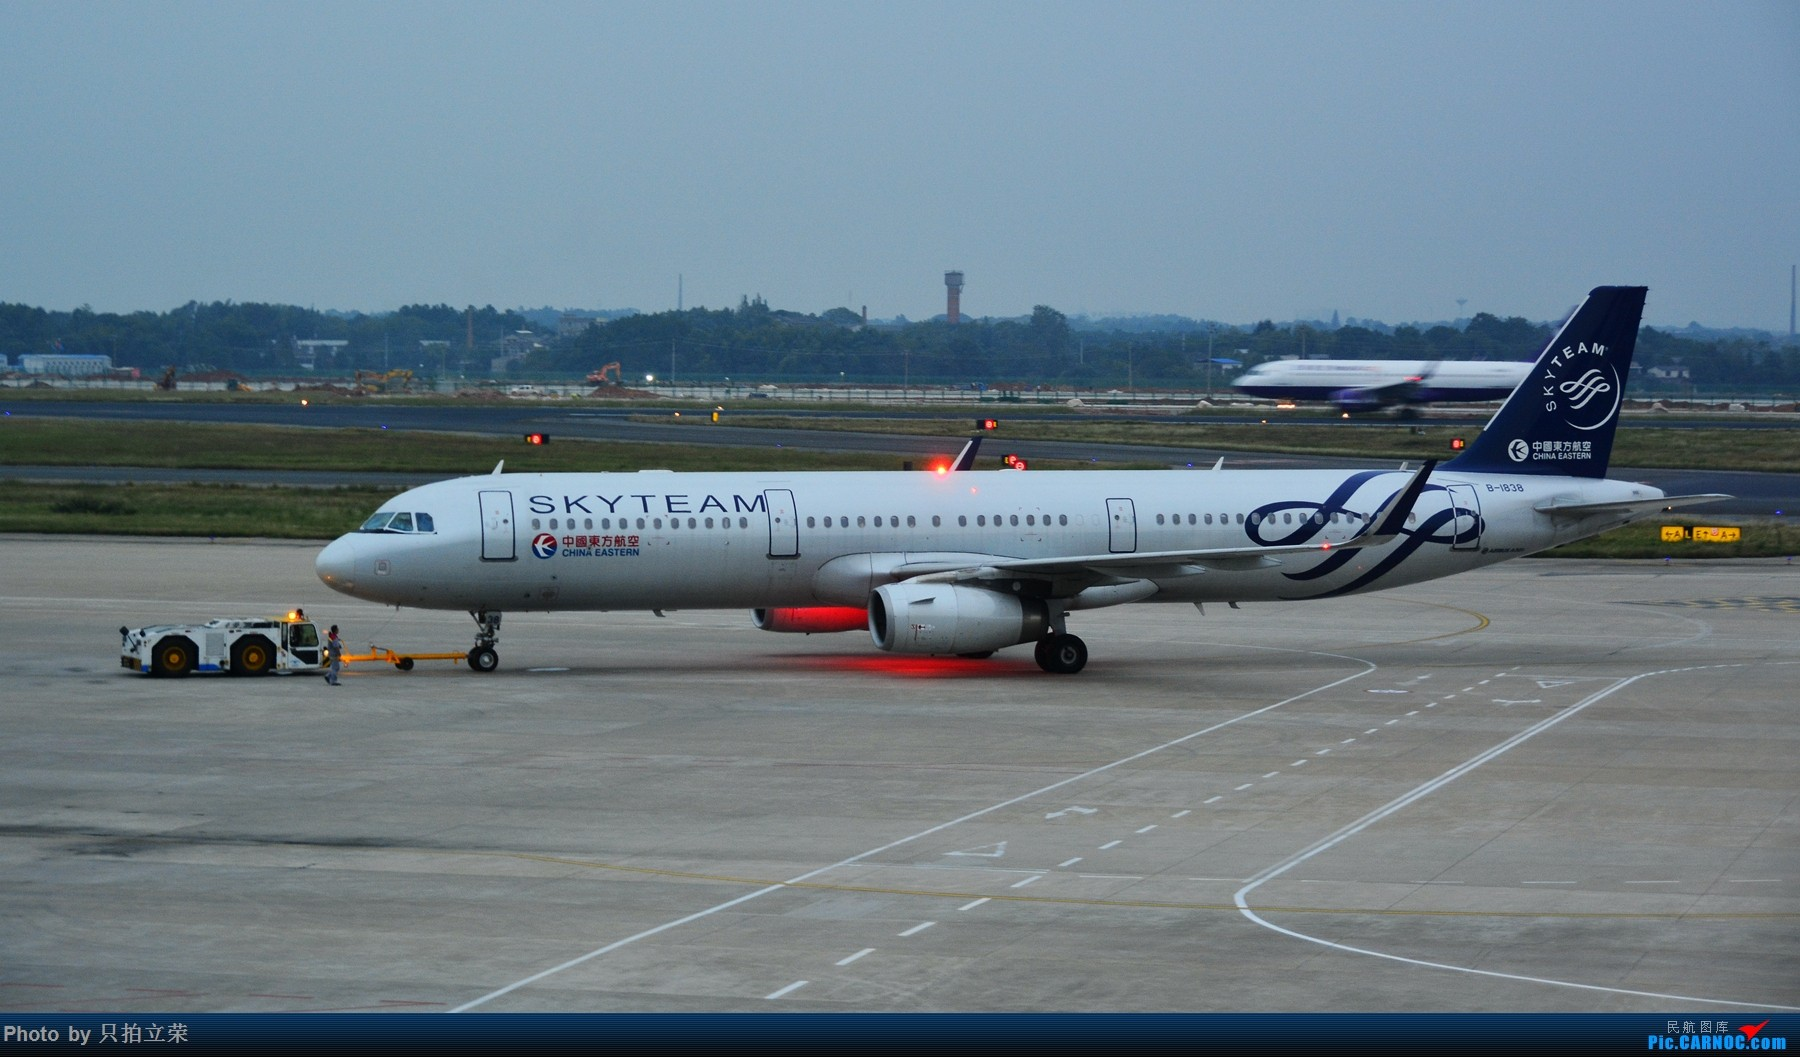 Re:[原创]湖南飞友会之10月9日长沙黄花好货满天飞! AIRBUS A321-200 B-1838 中国长沙黄花国际机场